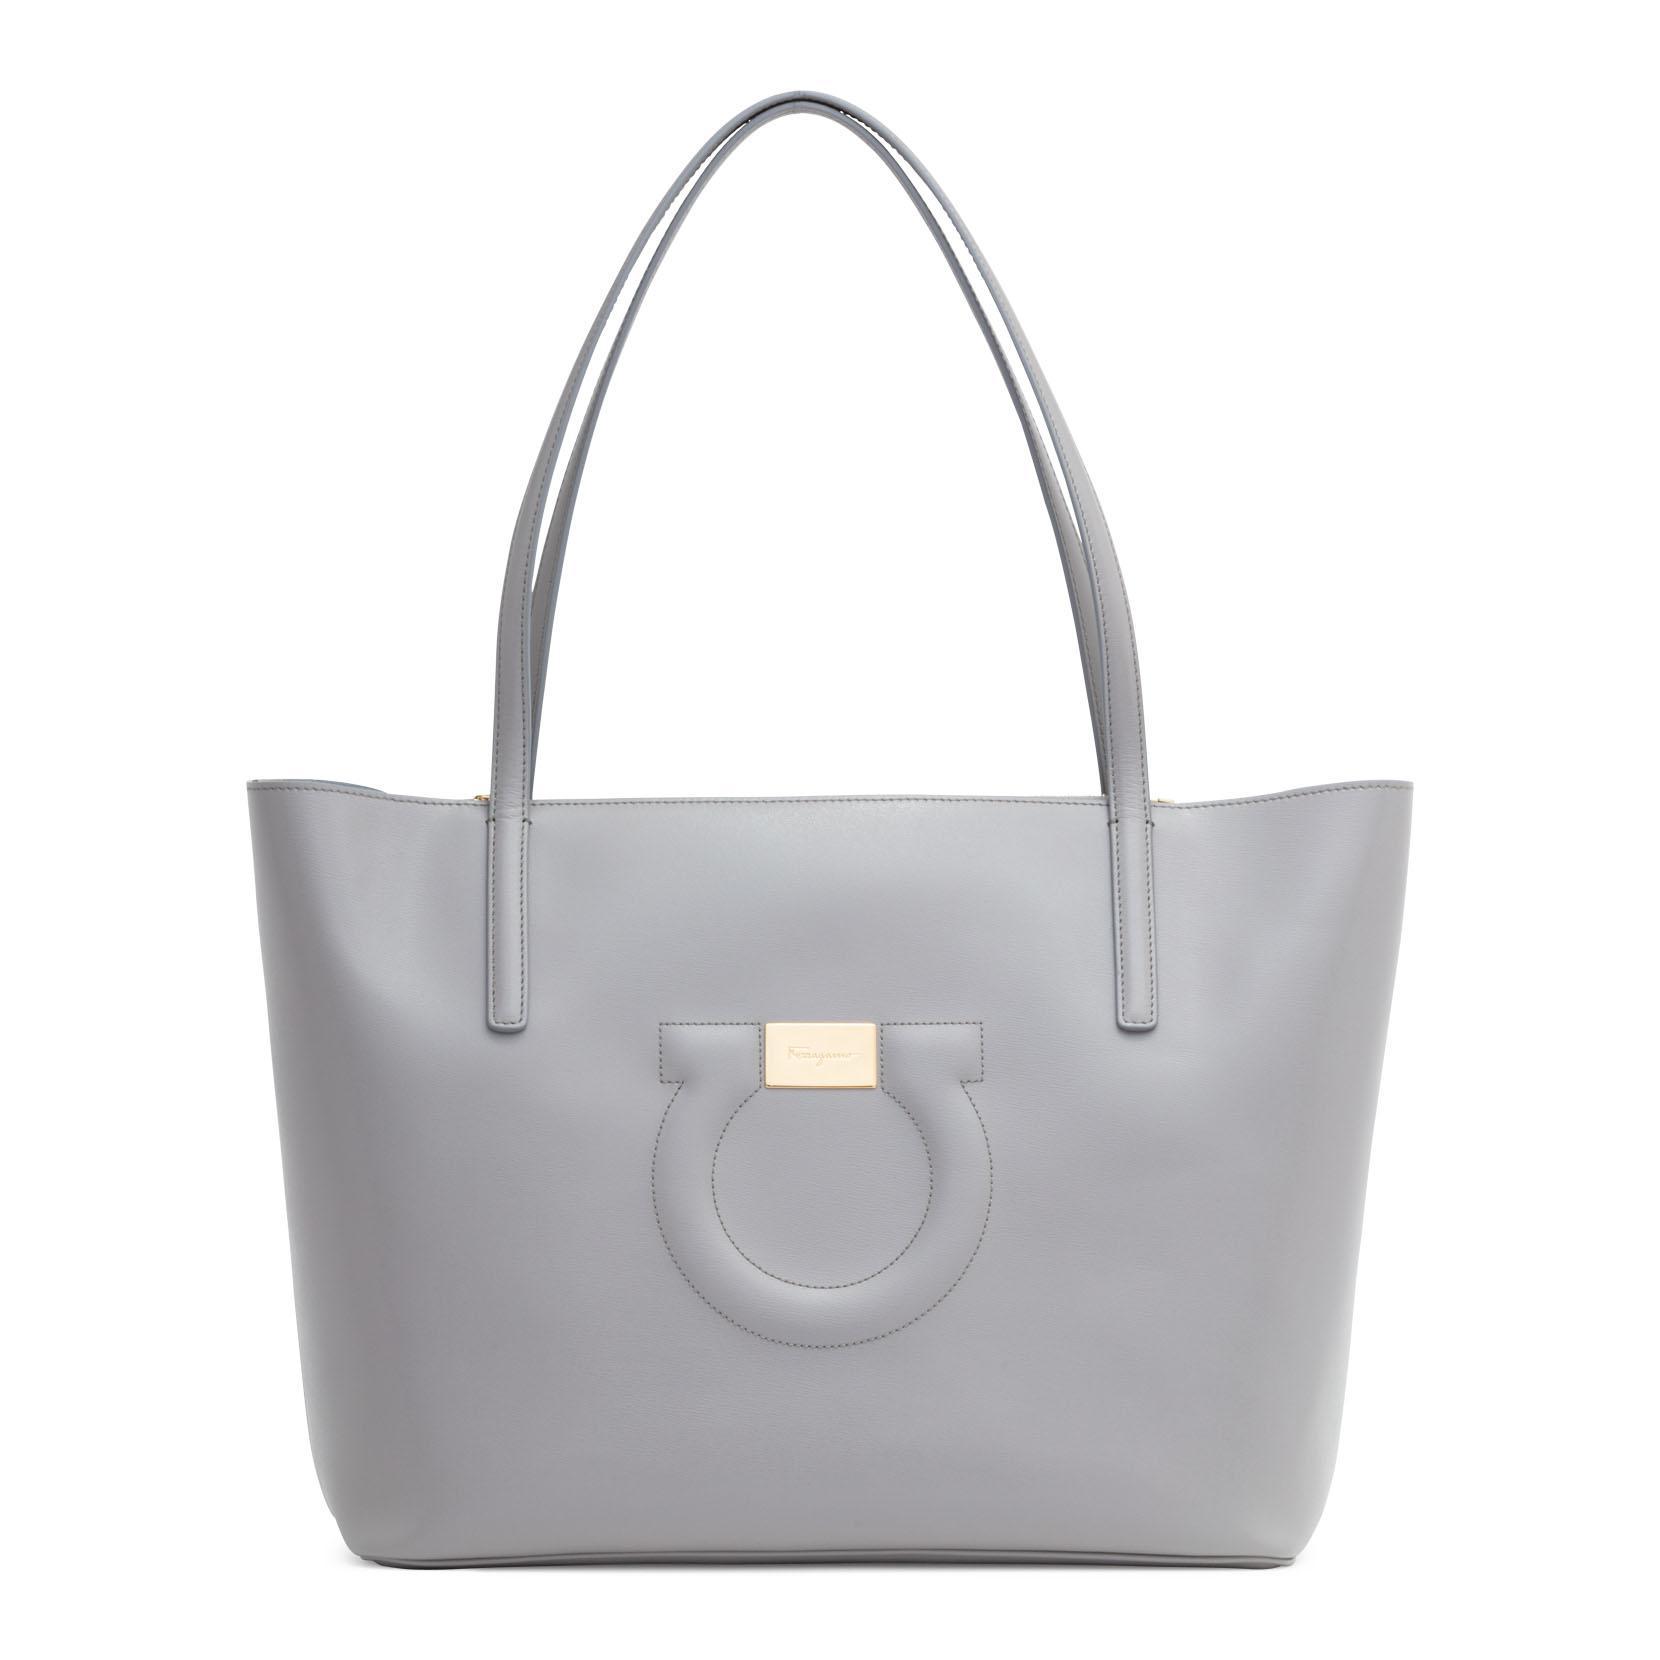 Salvatore Ferragamo Gancio City Light Grey Leather Tote Bag 4GanK8